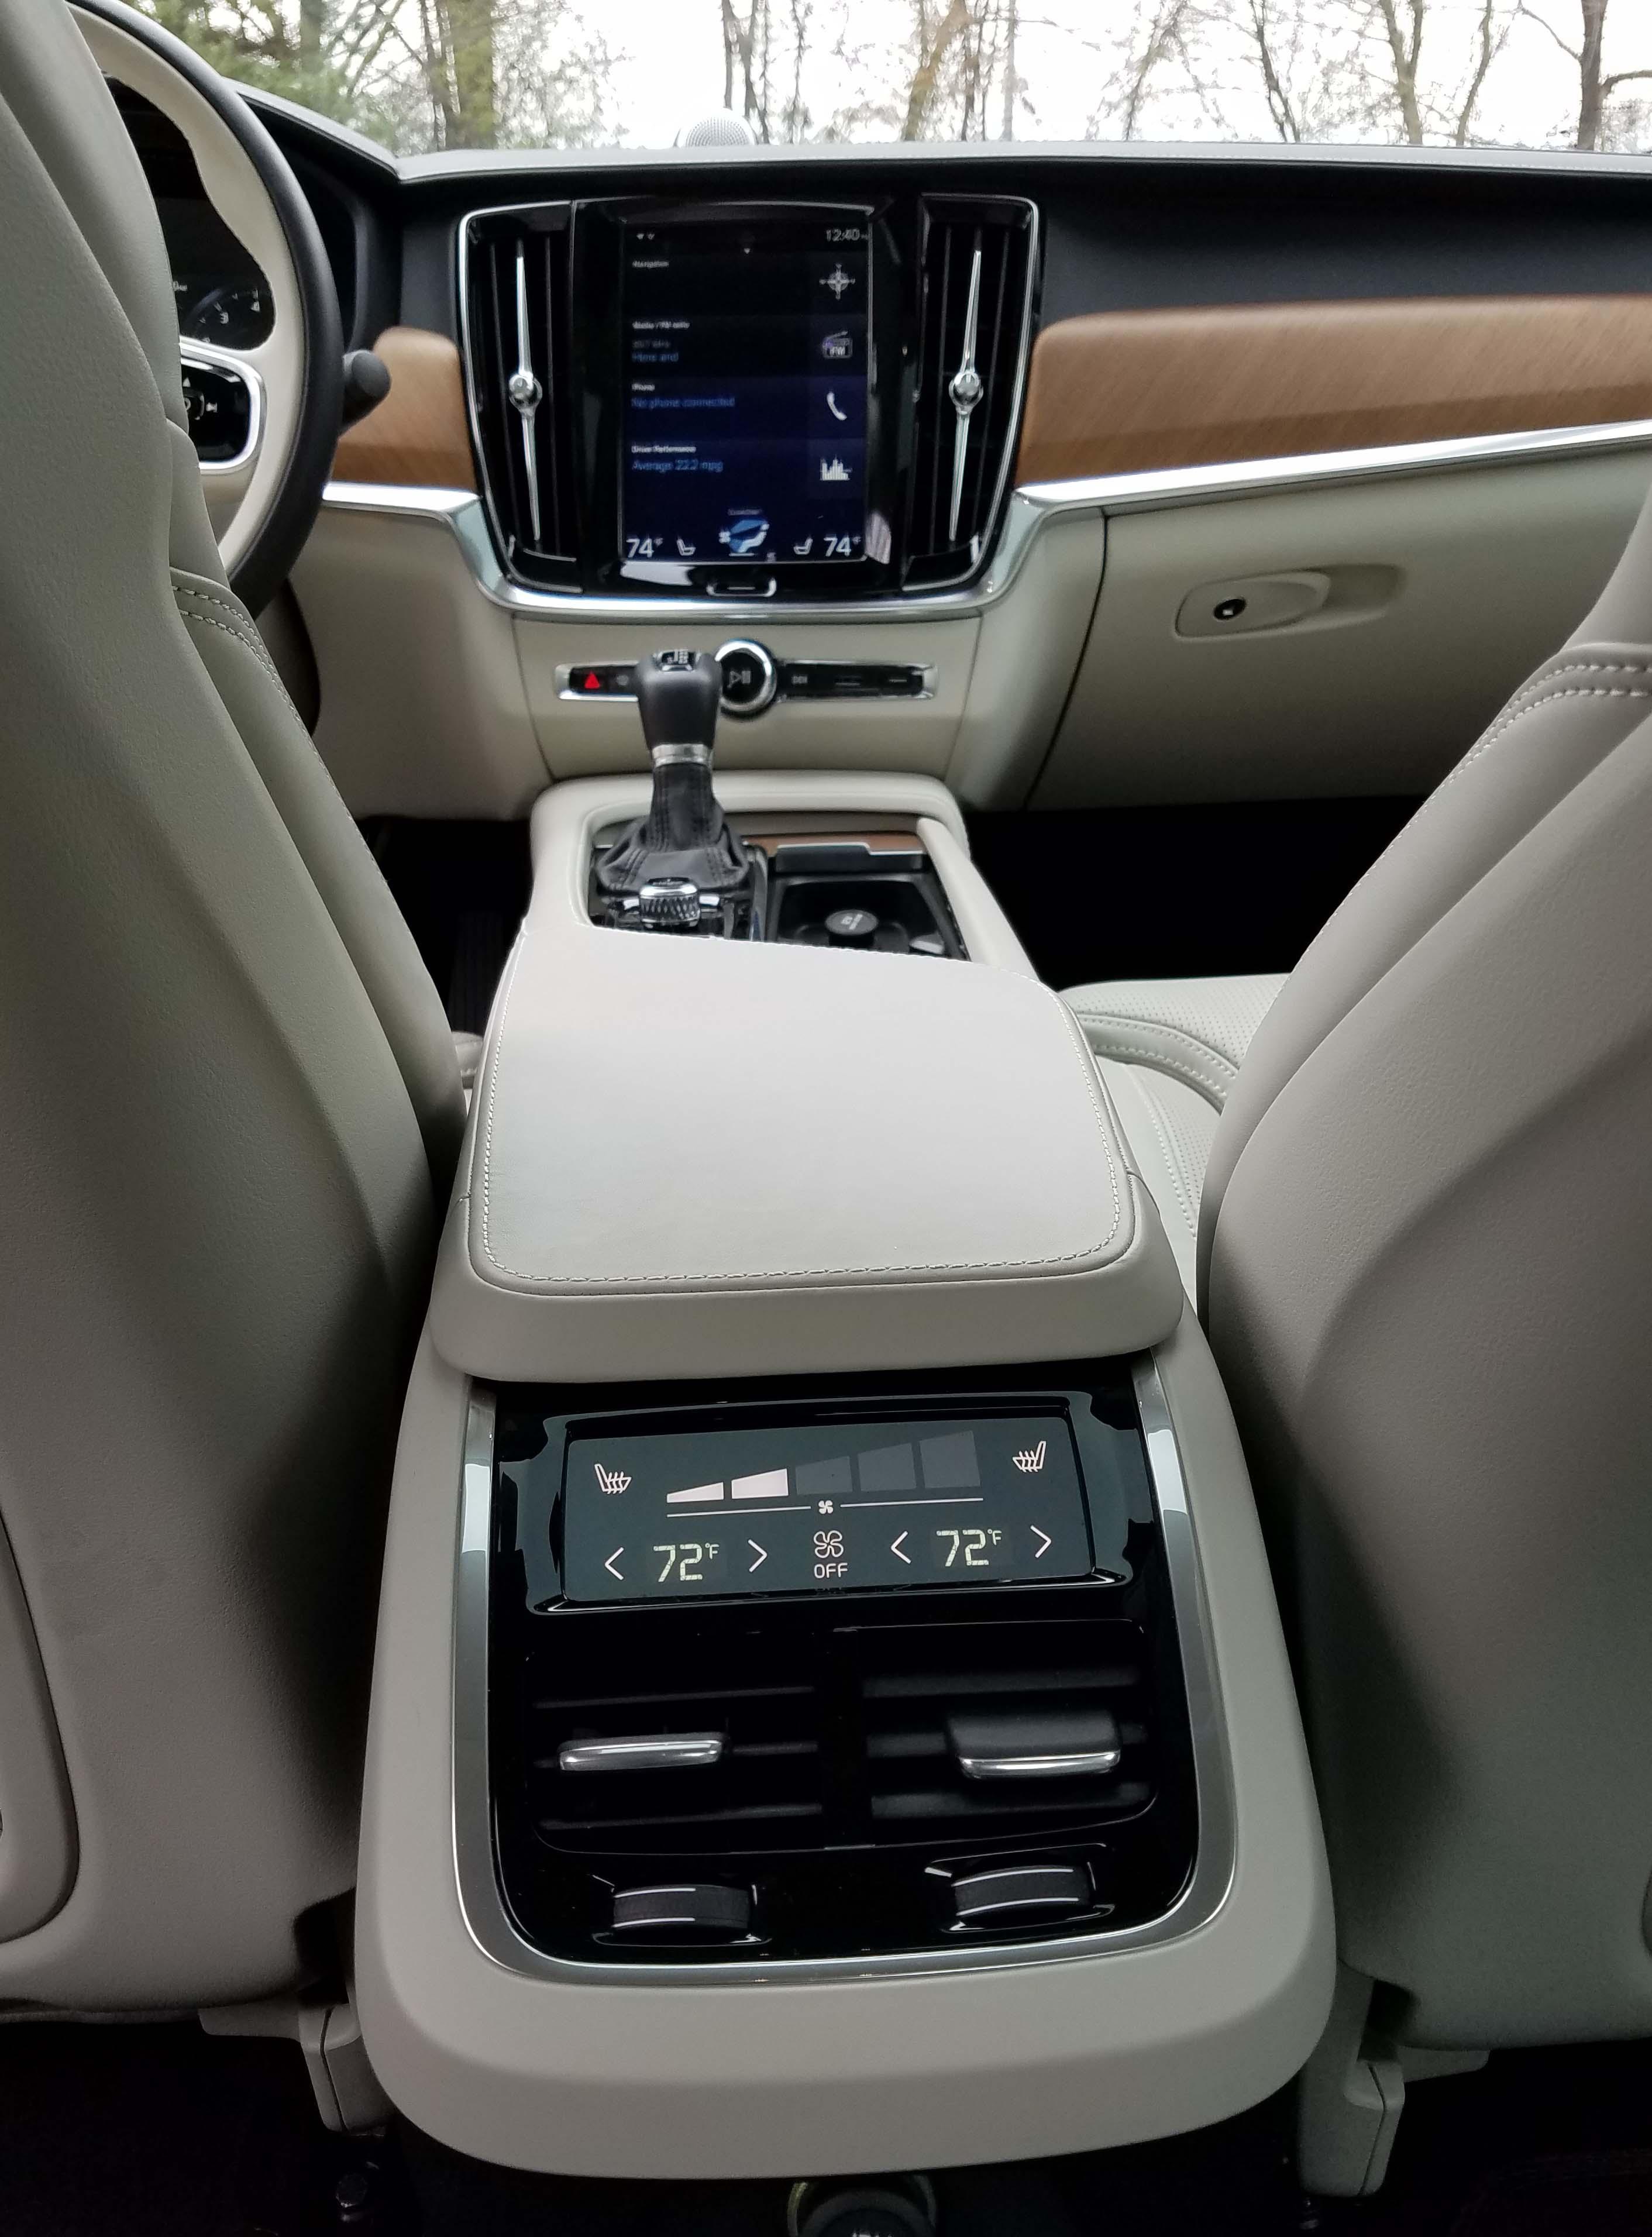 2017 Volvo S90 T6 AWD Inscription | Savage On Wheels